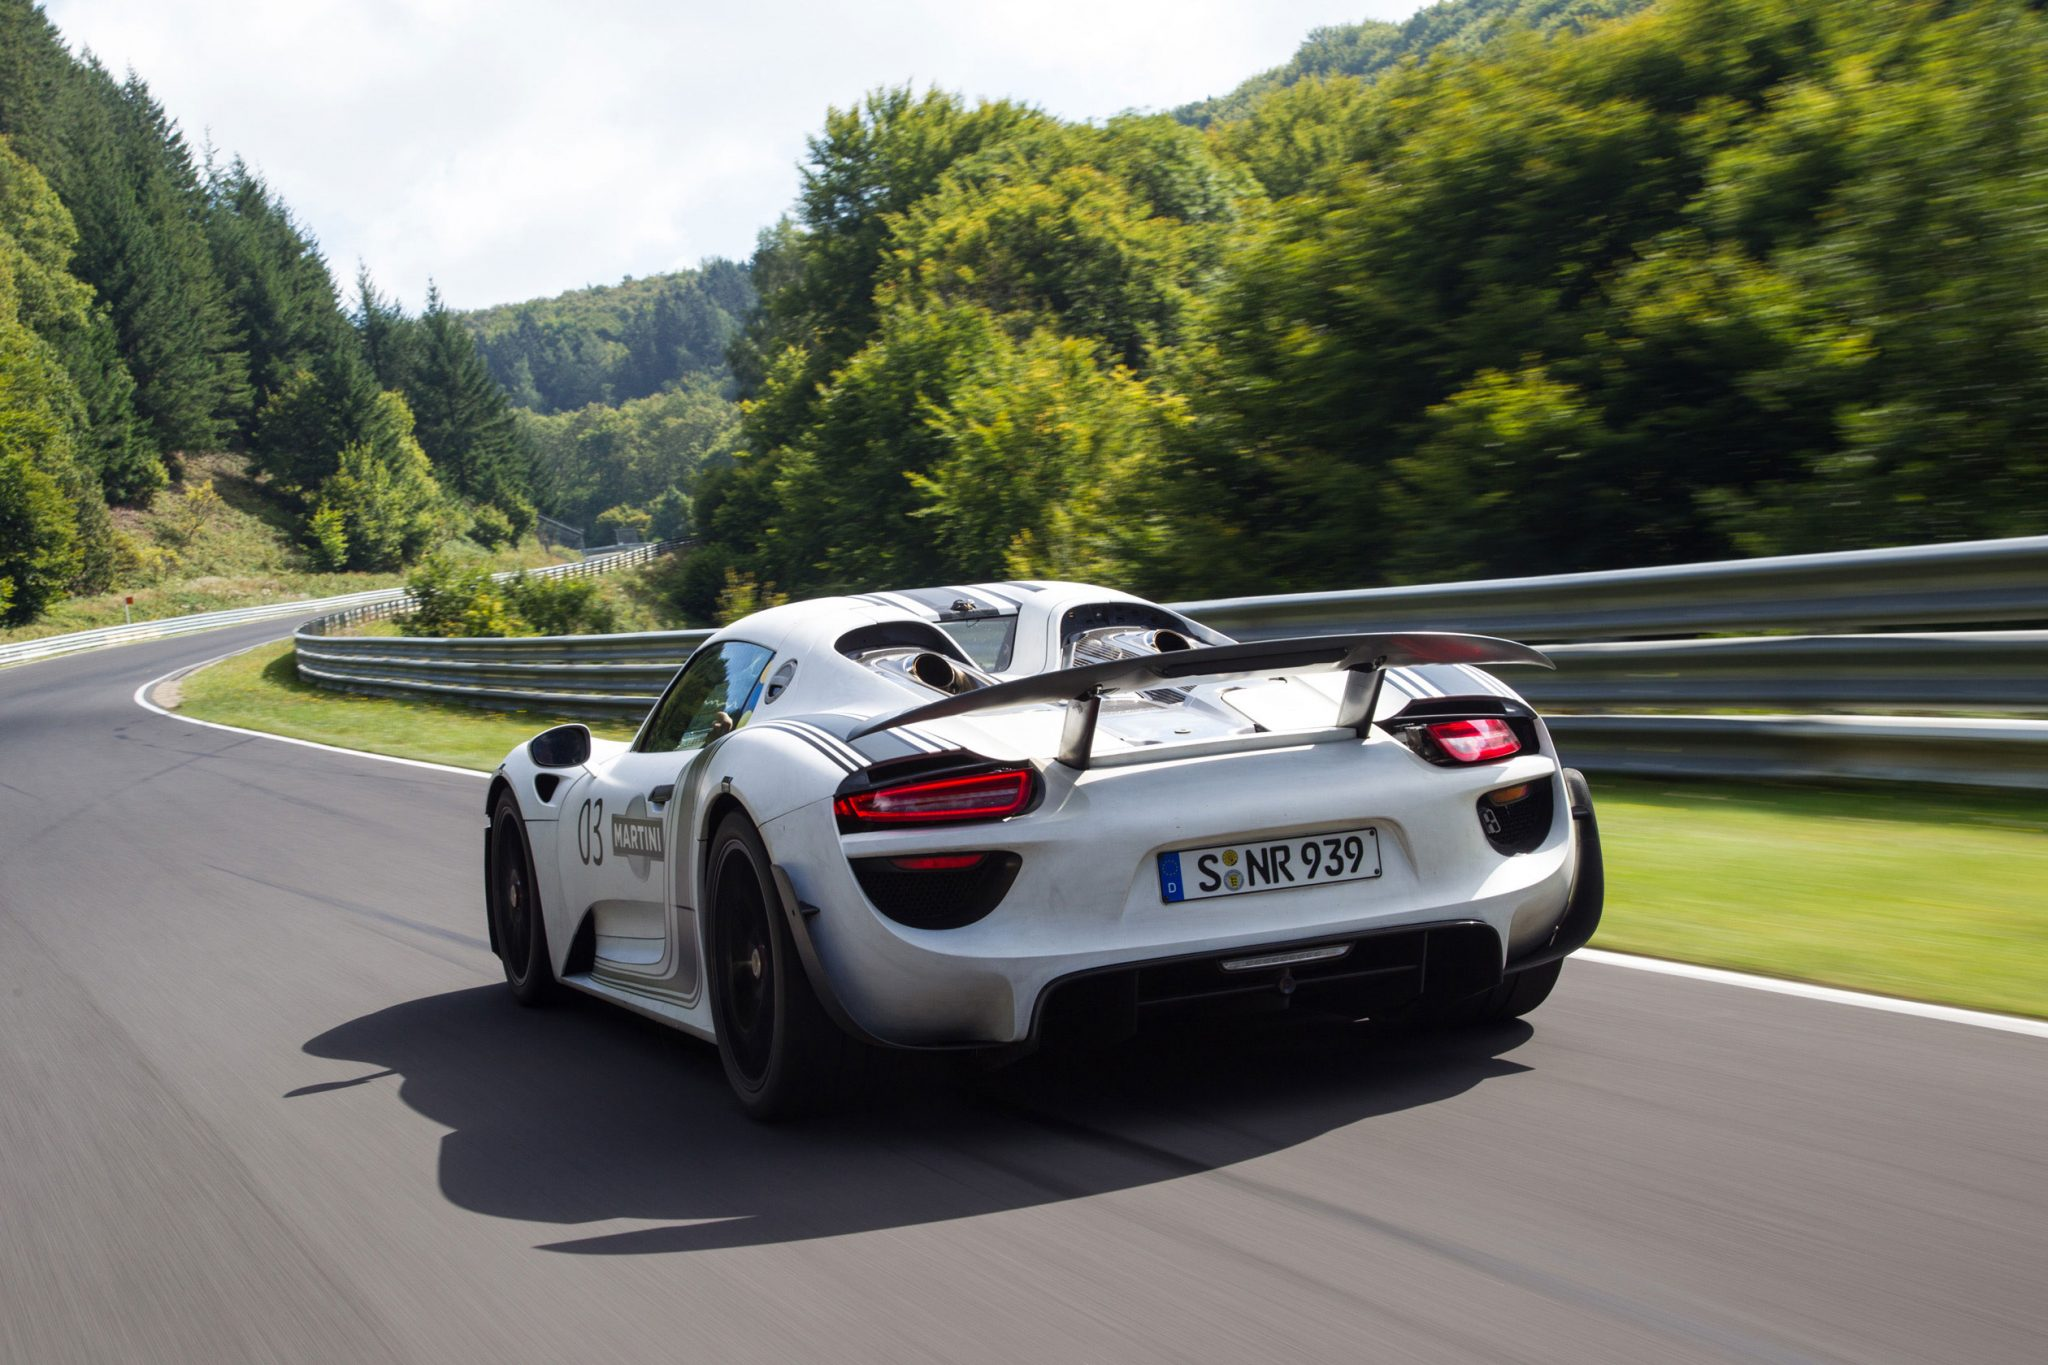 porsche 918 spyder prototype laps nrburgring in 714 minutes